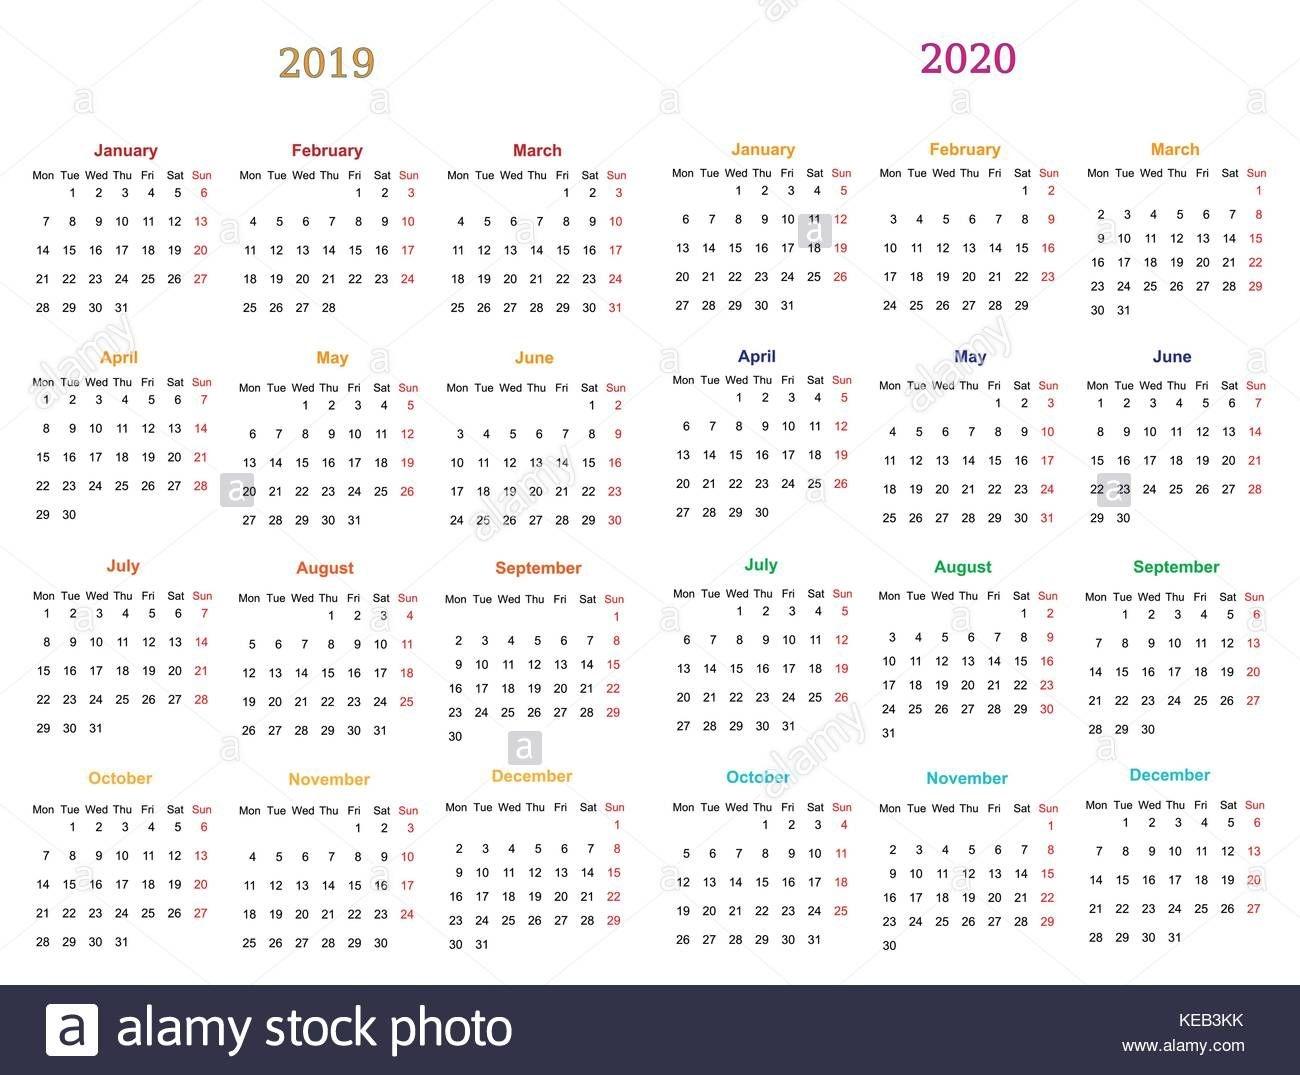 12 Months Calendar Design 2019-2020 Printable And Editable